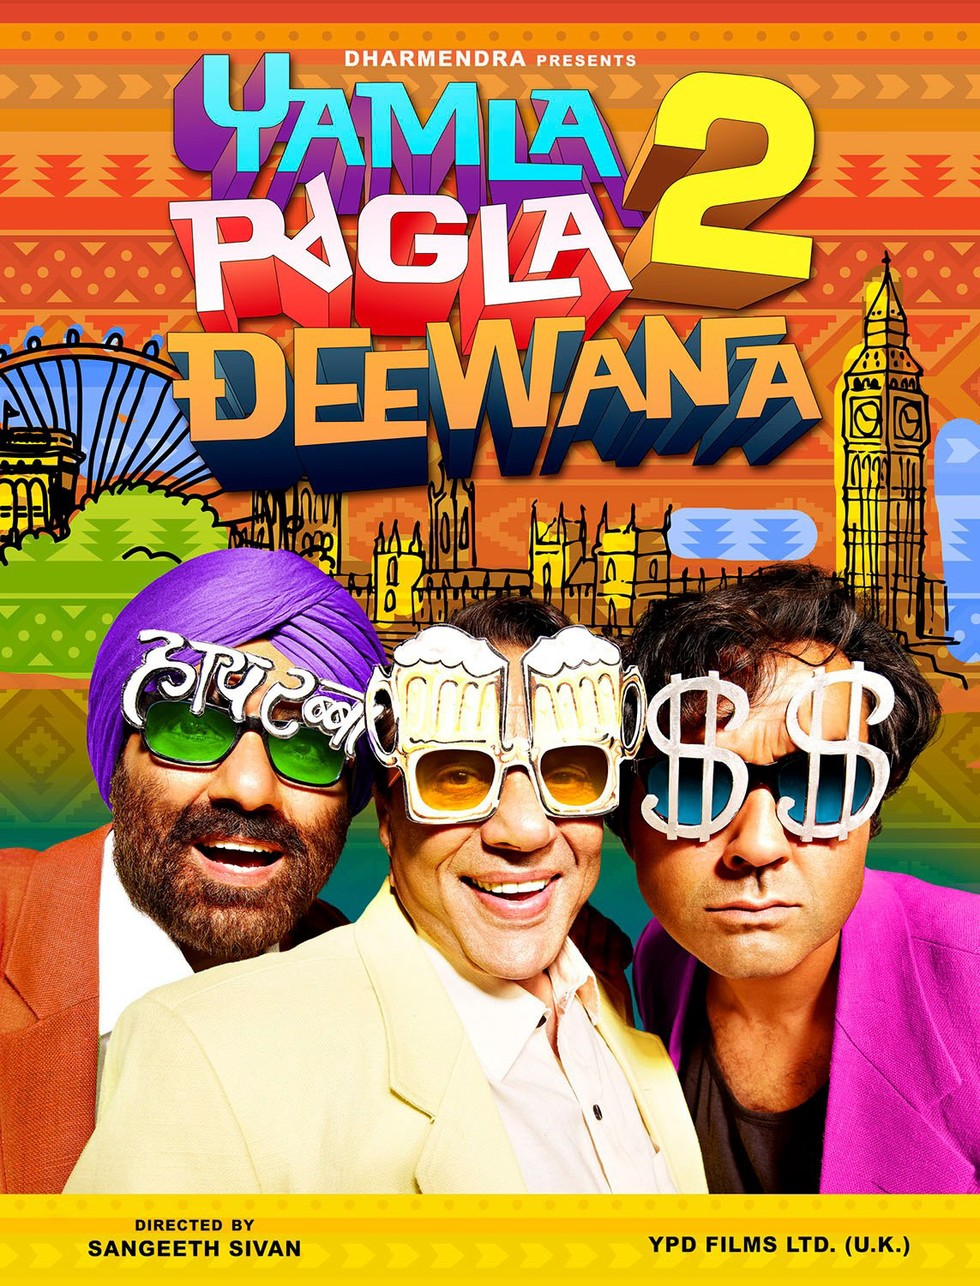 Yamla Pagla Deewana 2 - Movie Poster #1 (Large)